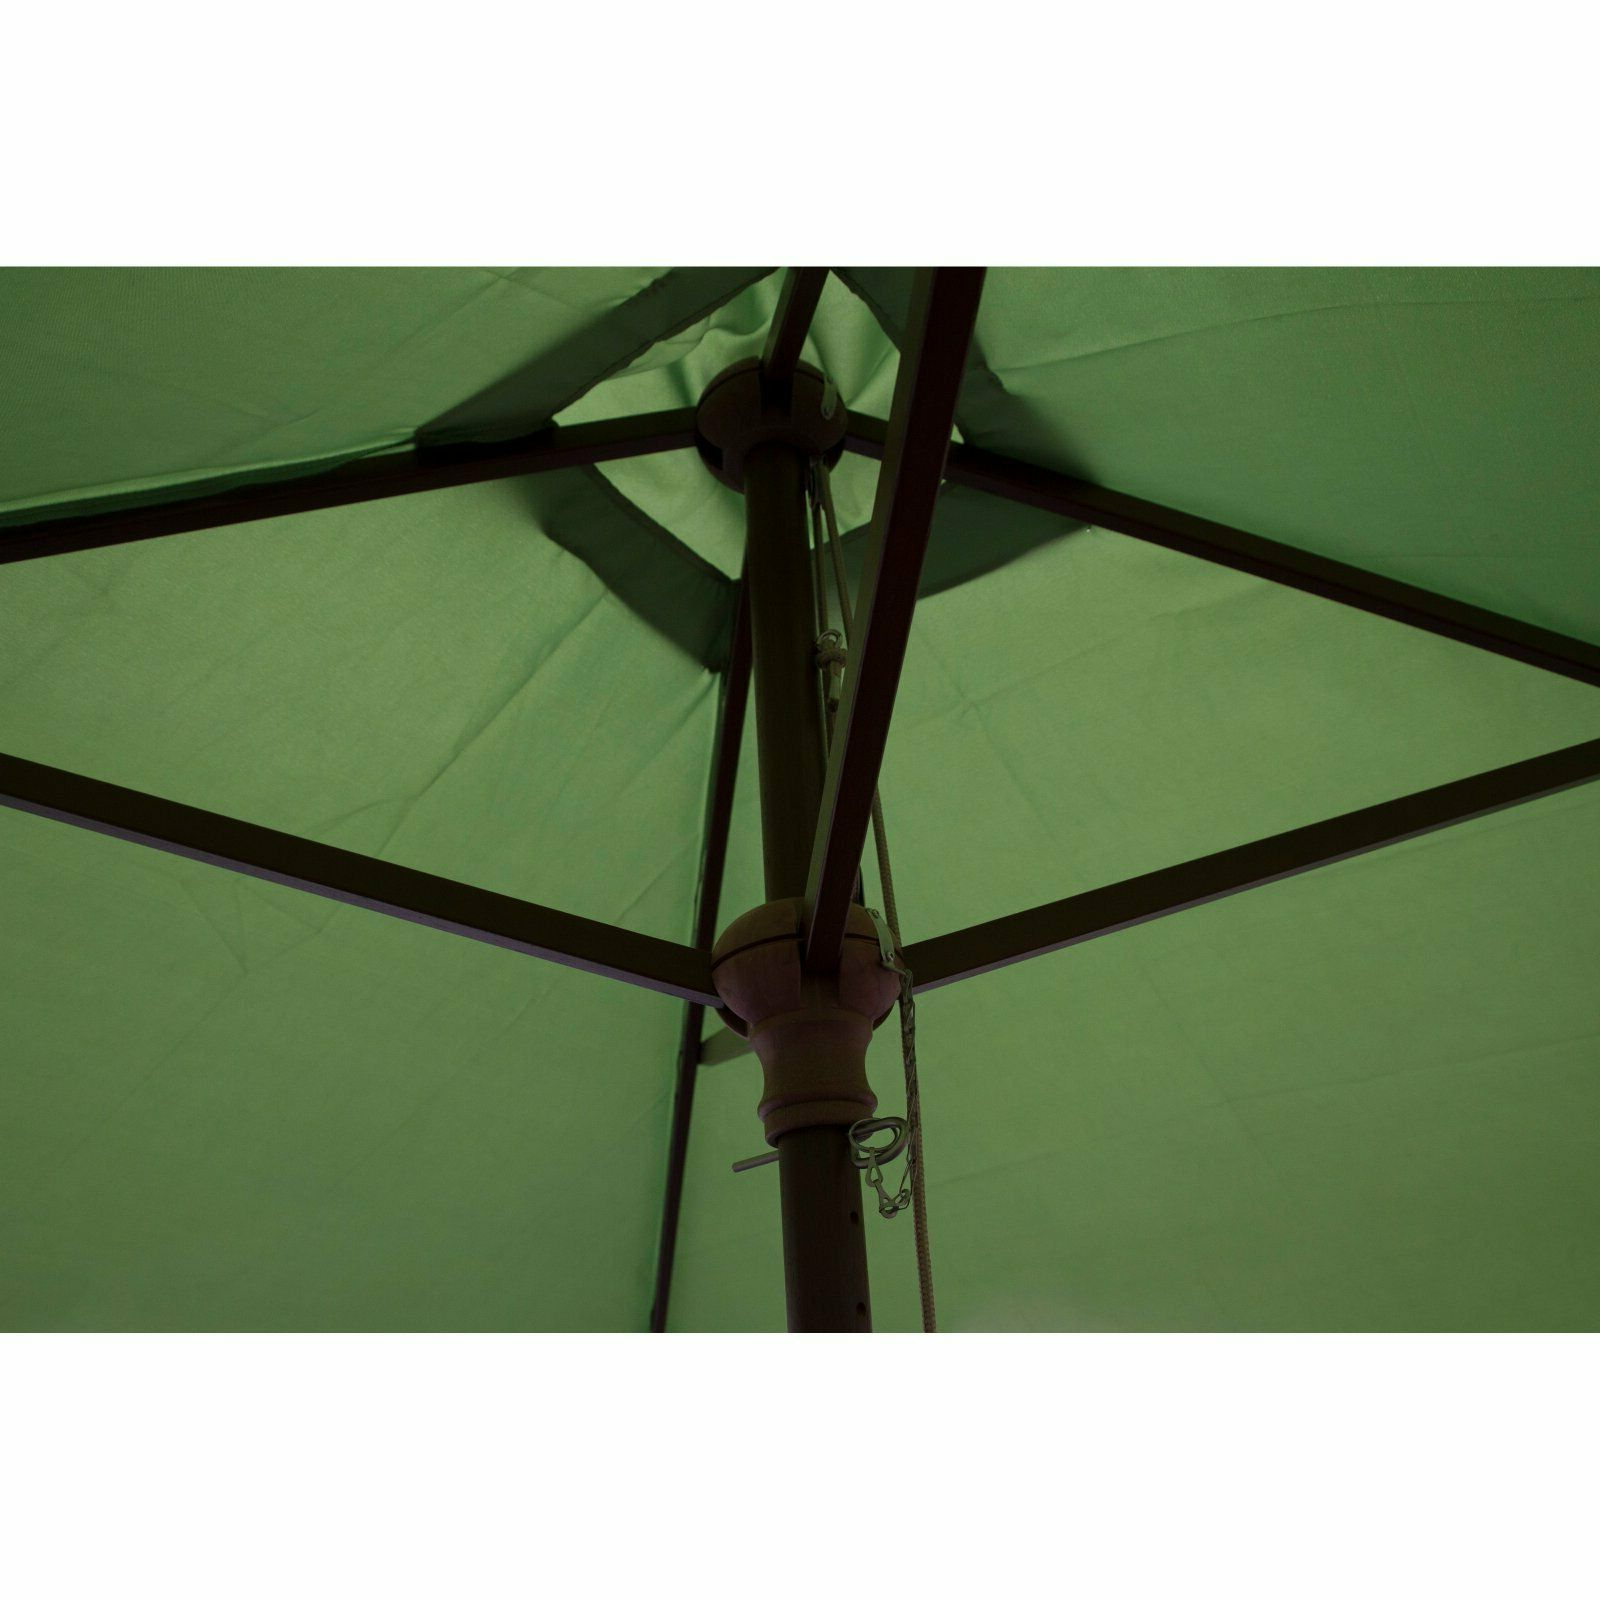 2019 Destination Gear Square Market Umbrellas Pertaining To Destinationgear 6.5 Ft. Wood Classic Square Patio Umbrella (Gallery 9 of 20)